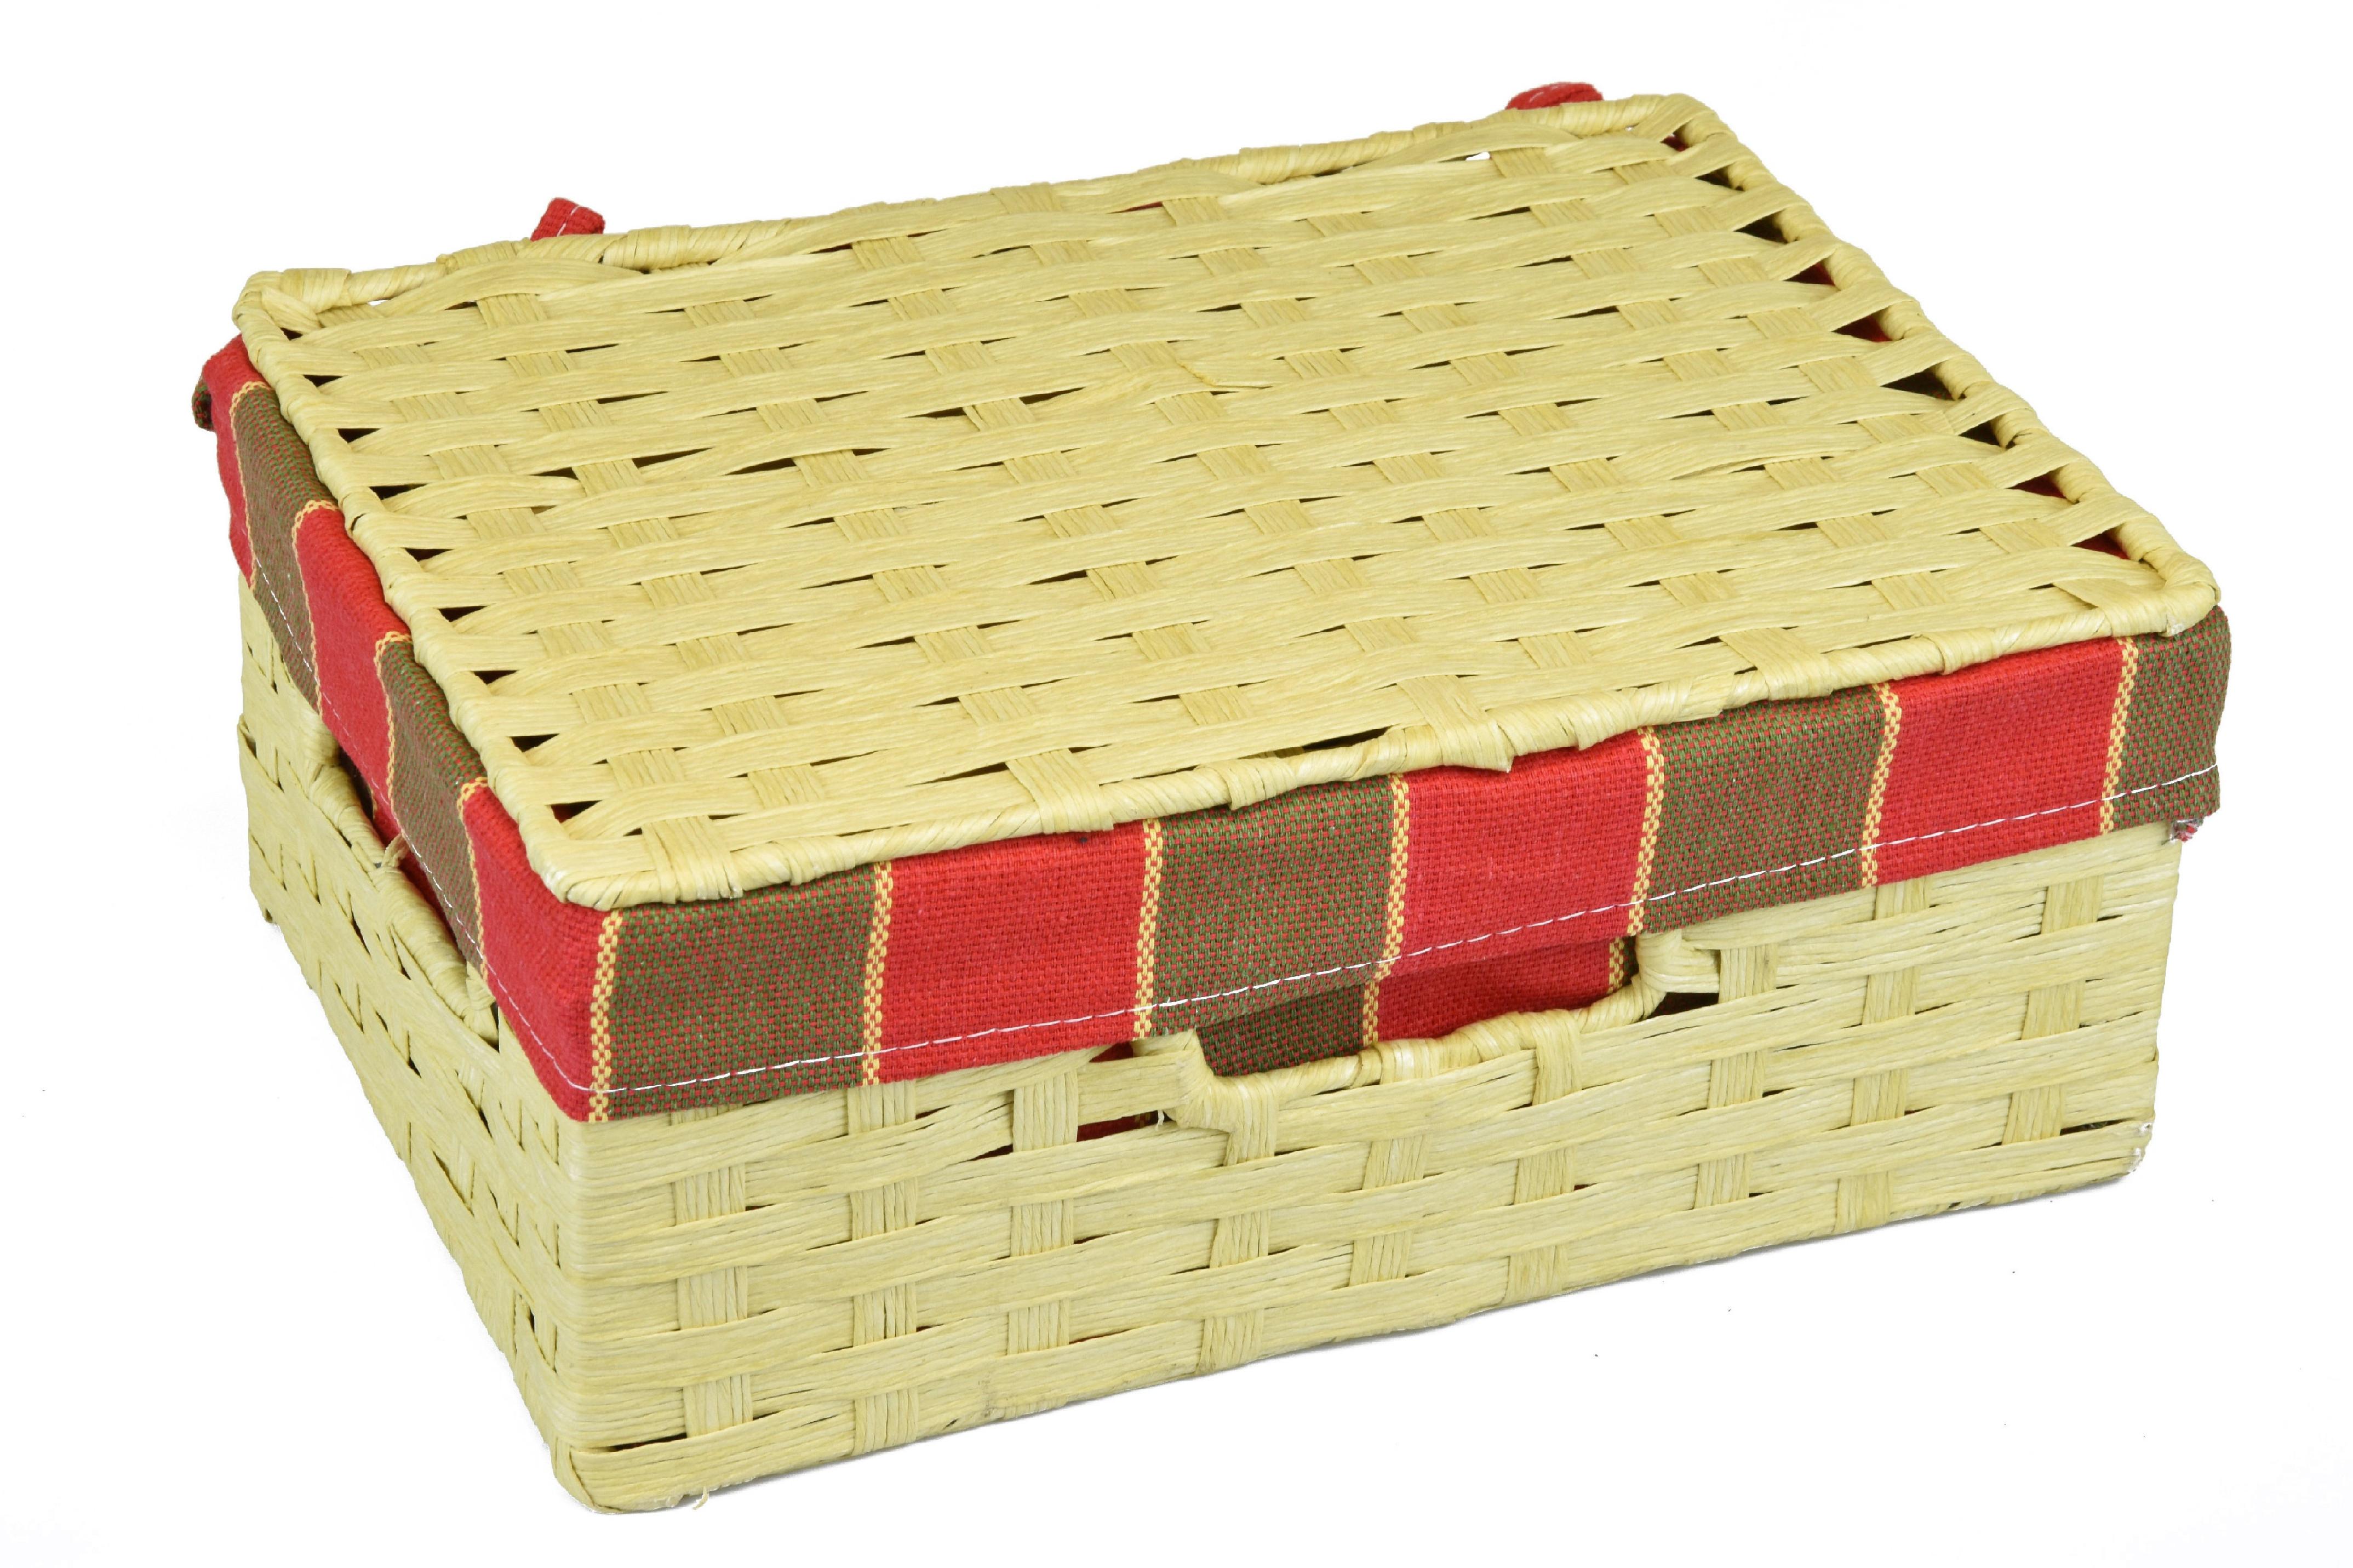 Úložný box s víkem rozměry boxu (cm): Sada 30x21x13|26x18x11|22x15x9